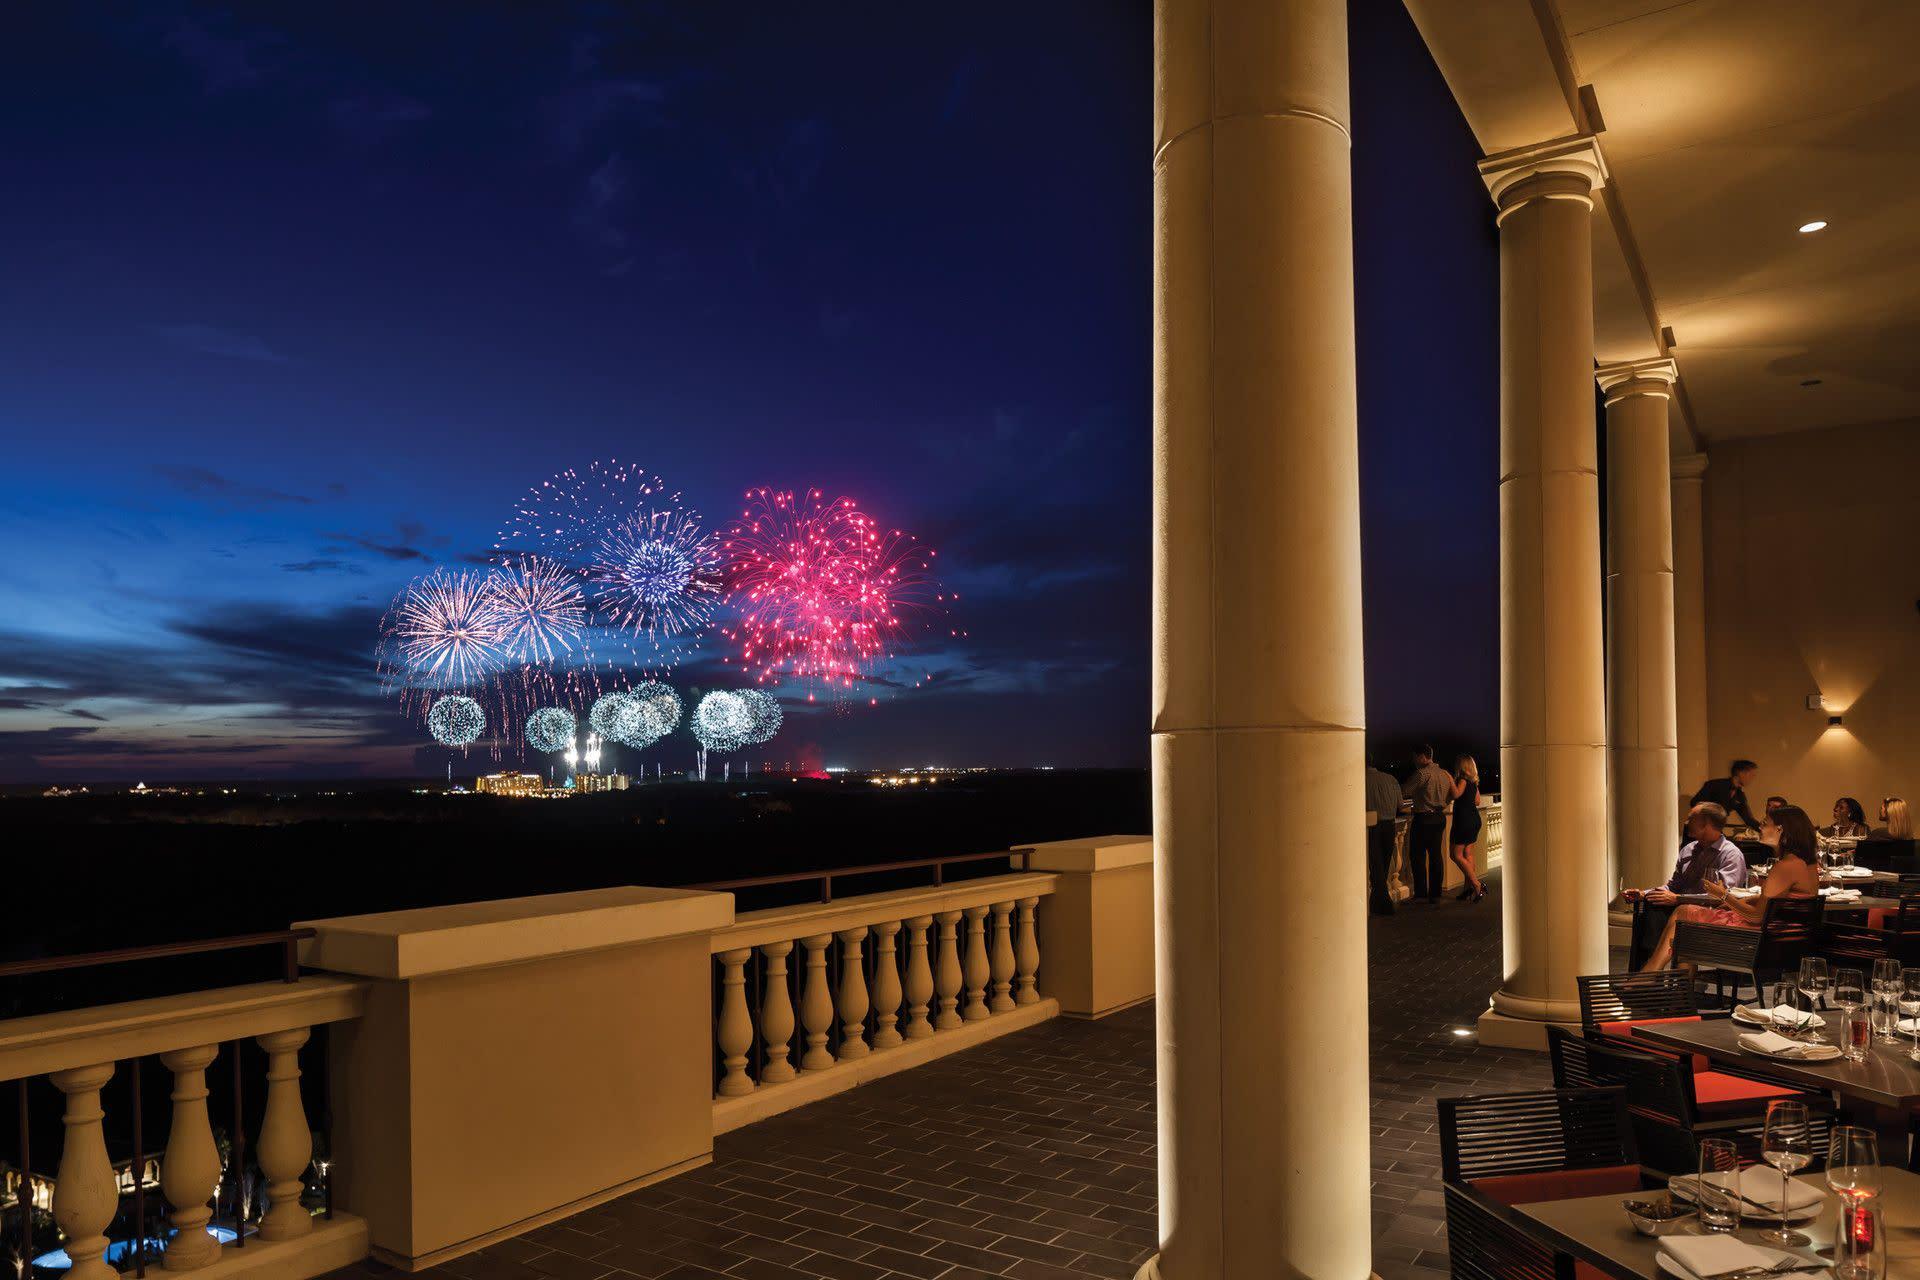 Capa at Four Seasons Resort Orlando at Walt Disney World Resort